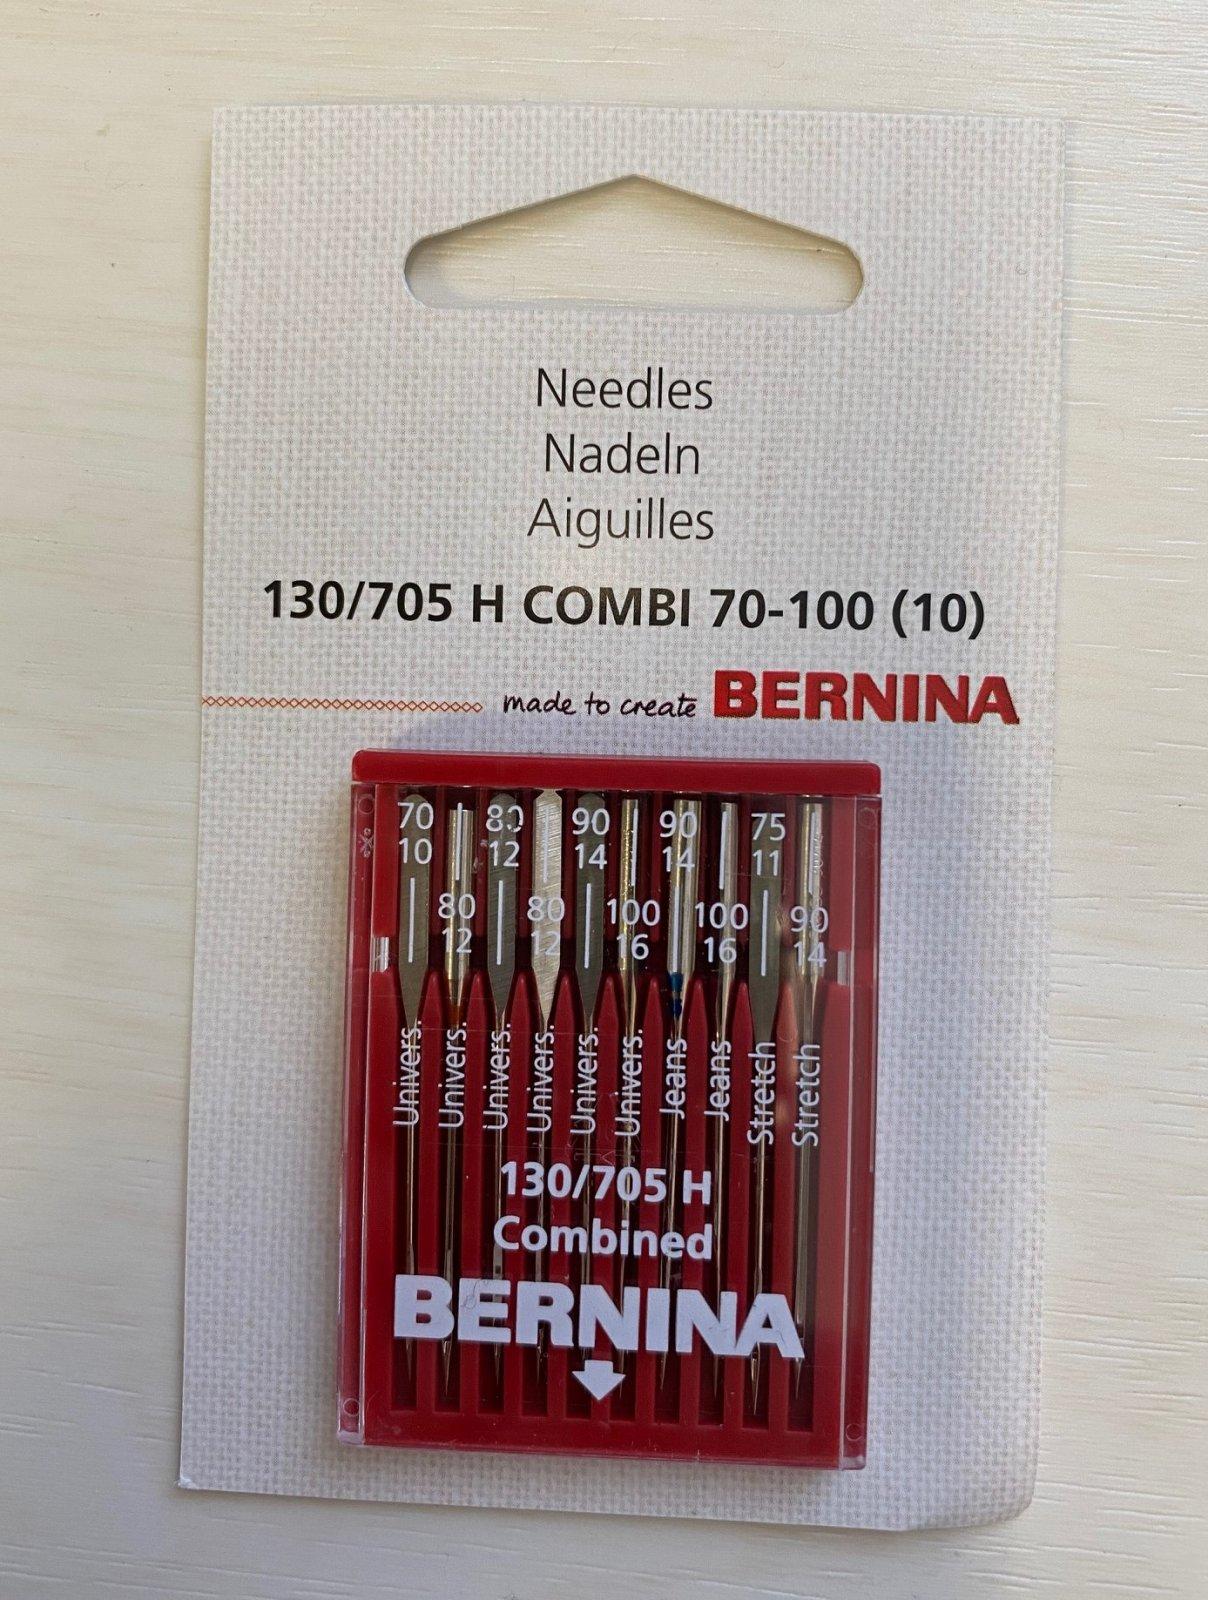 Bernina Needle Assortment 130/705 H Combi 70-100 (10 pack)